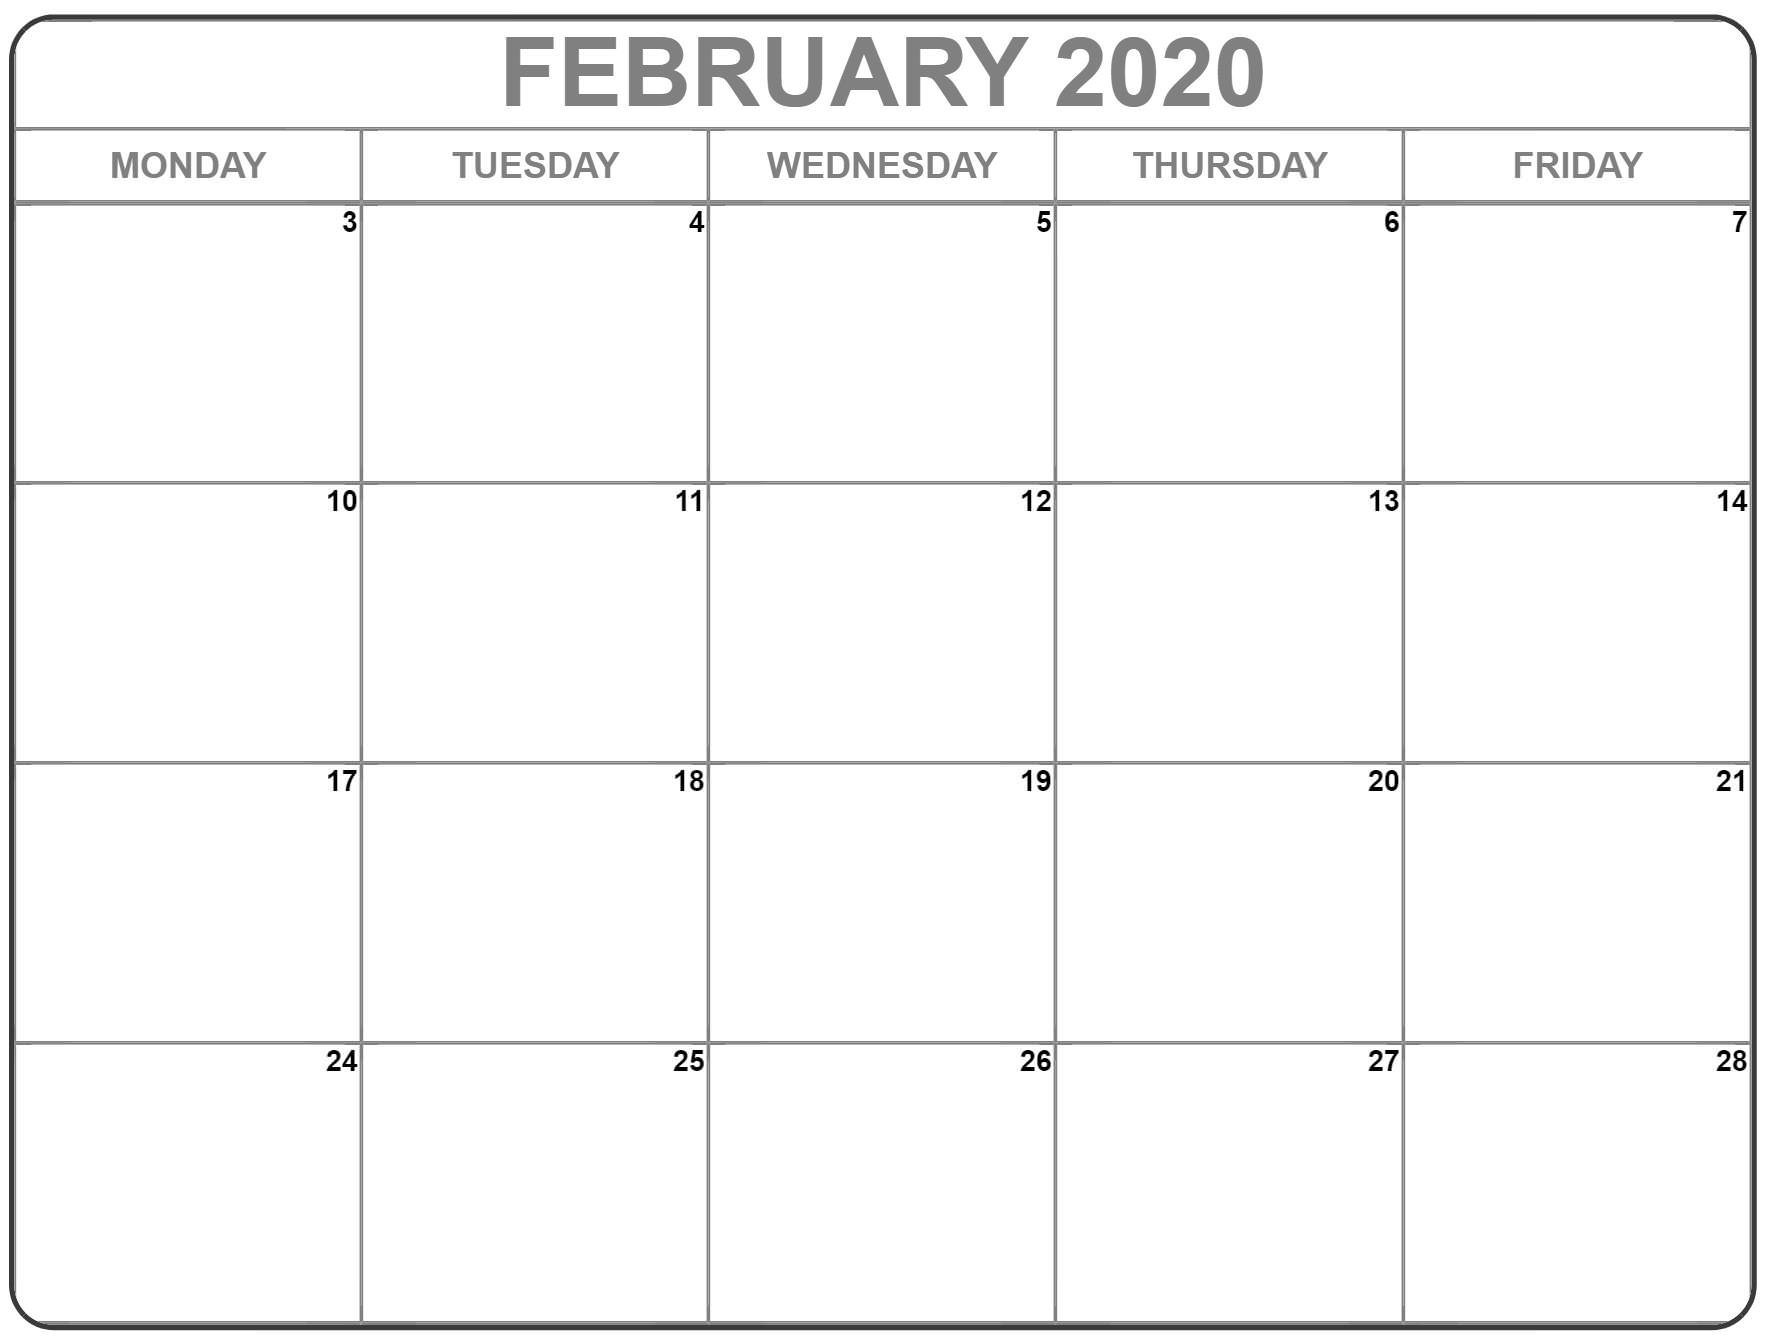 February 2020 Monday Calendar | Monday To Sunday Free Printable Monday Through Friday Calendar